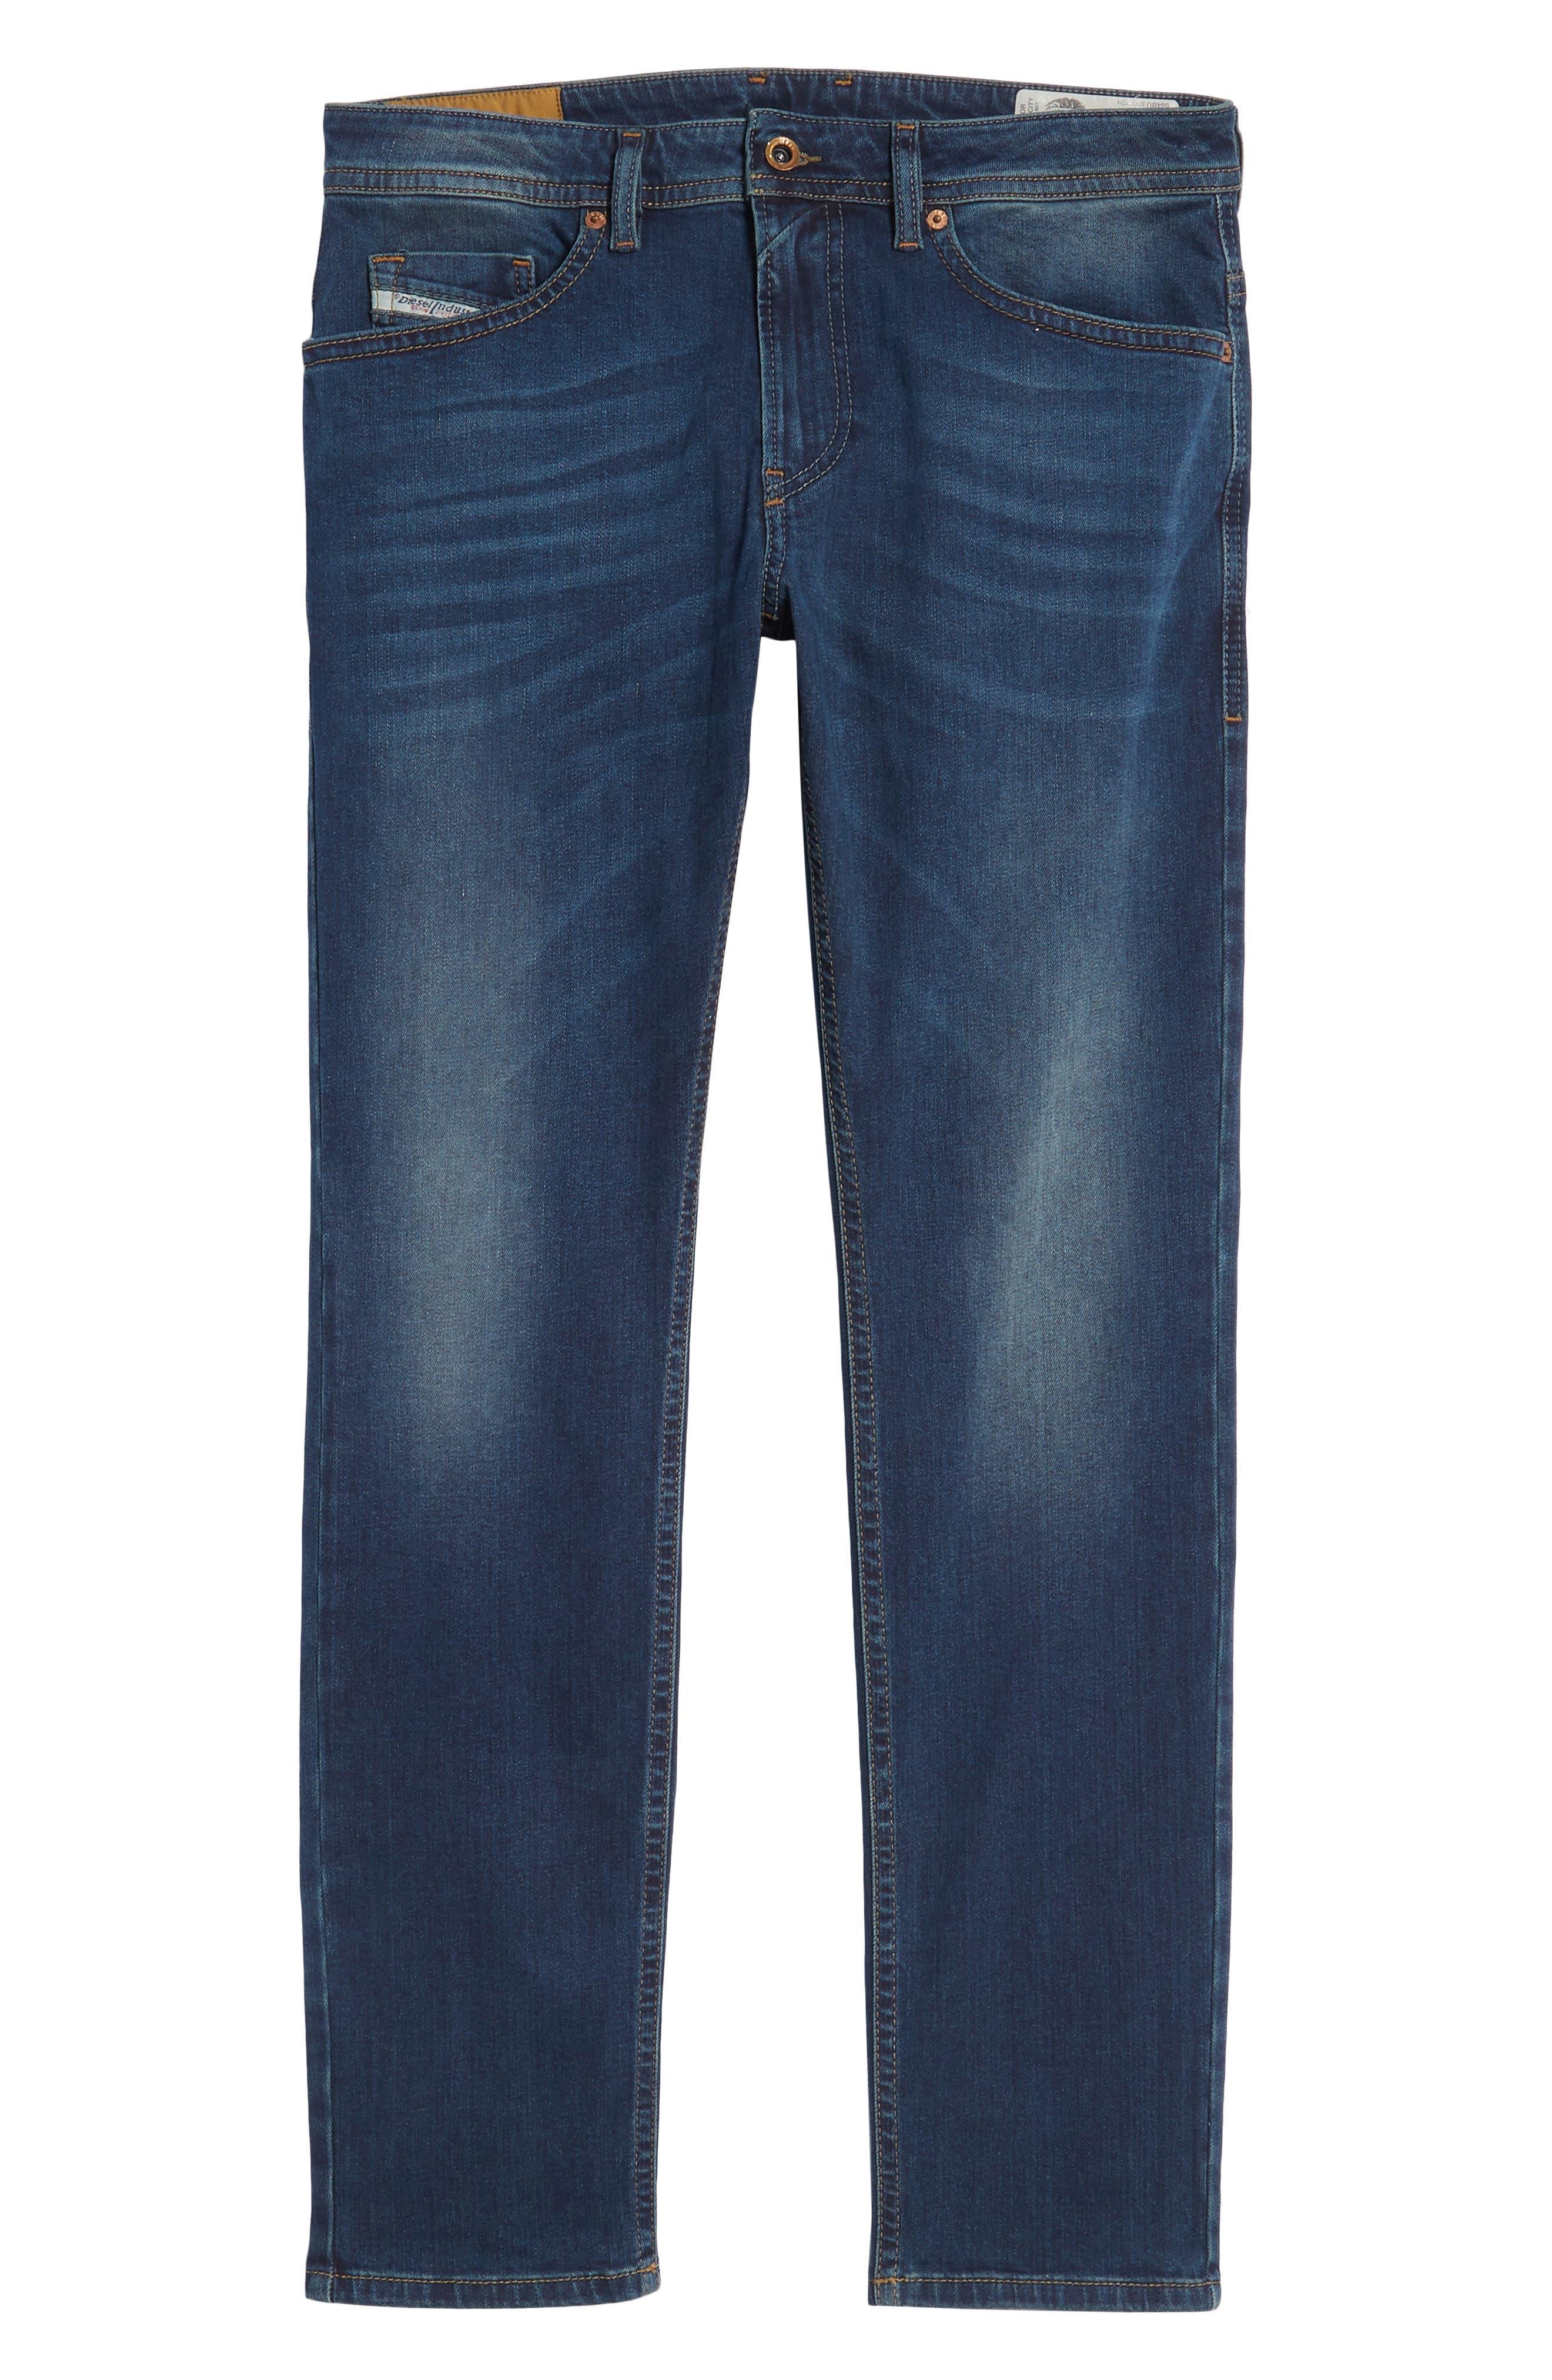 Thommer Skinny Fit Jeans,                             Alternate thumbnail 6, color,                             Blue